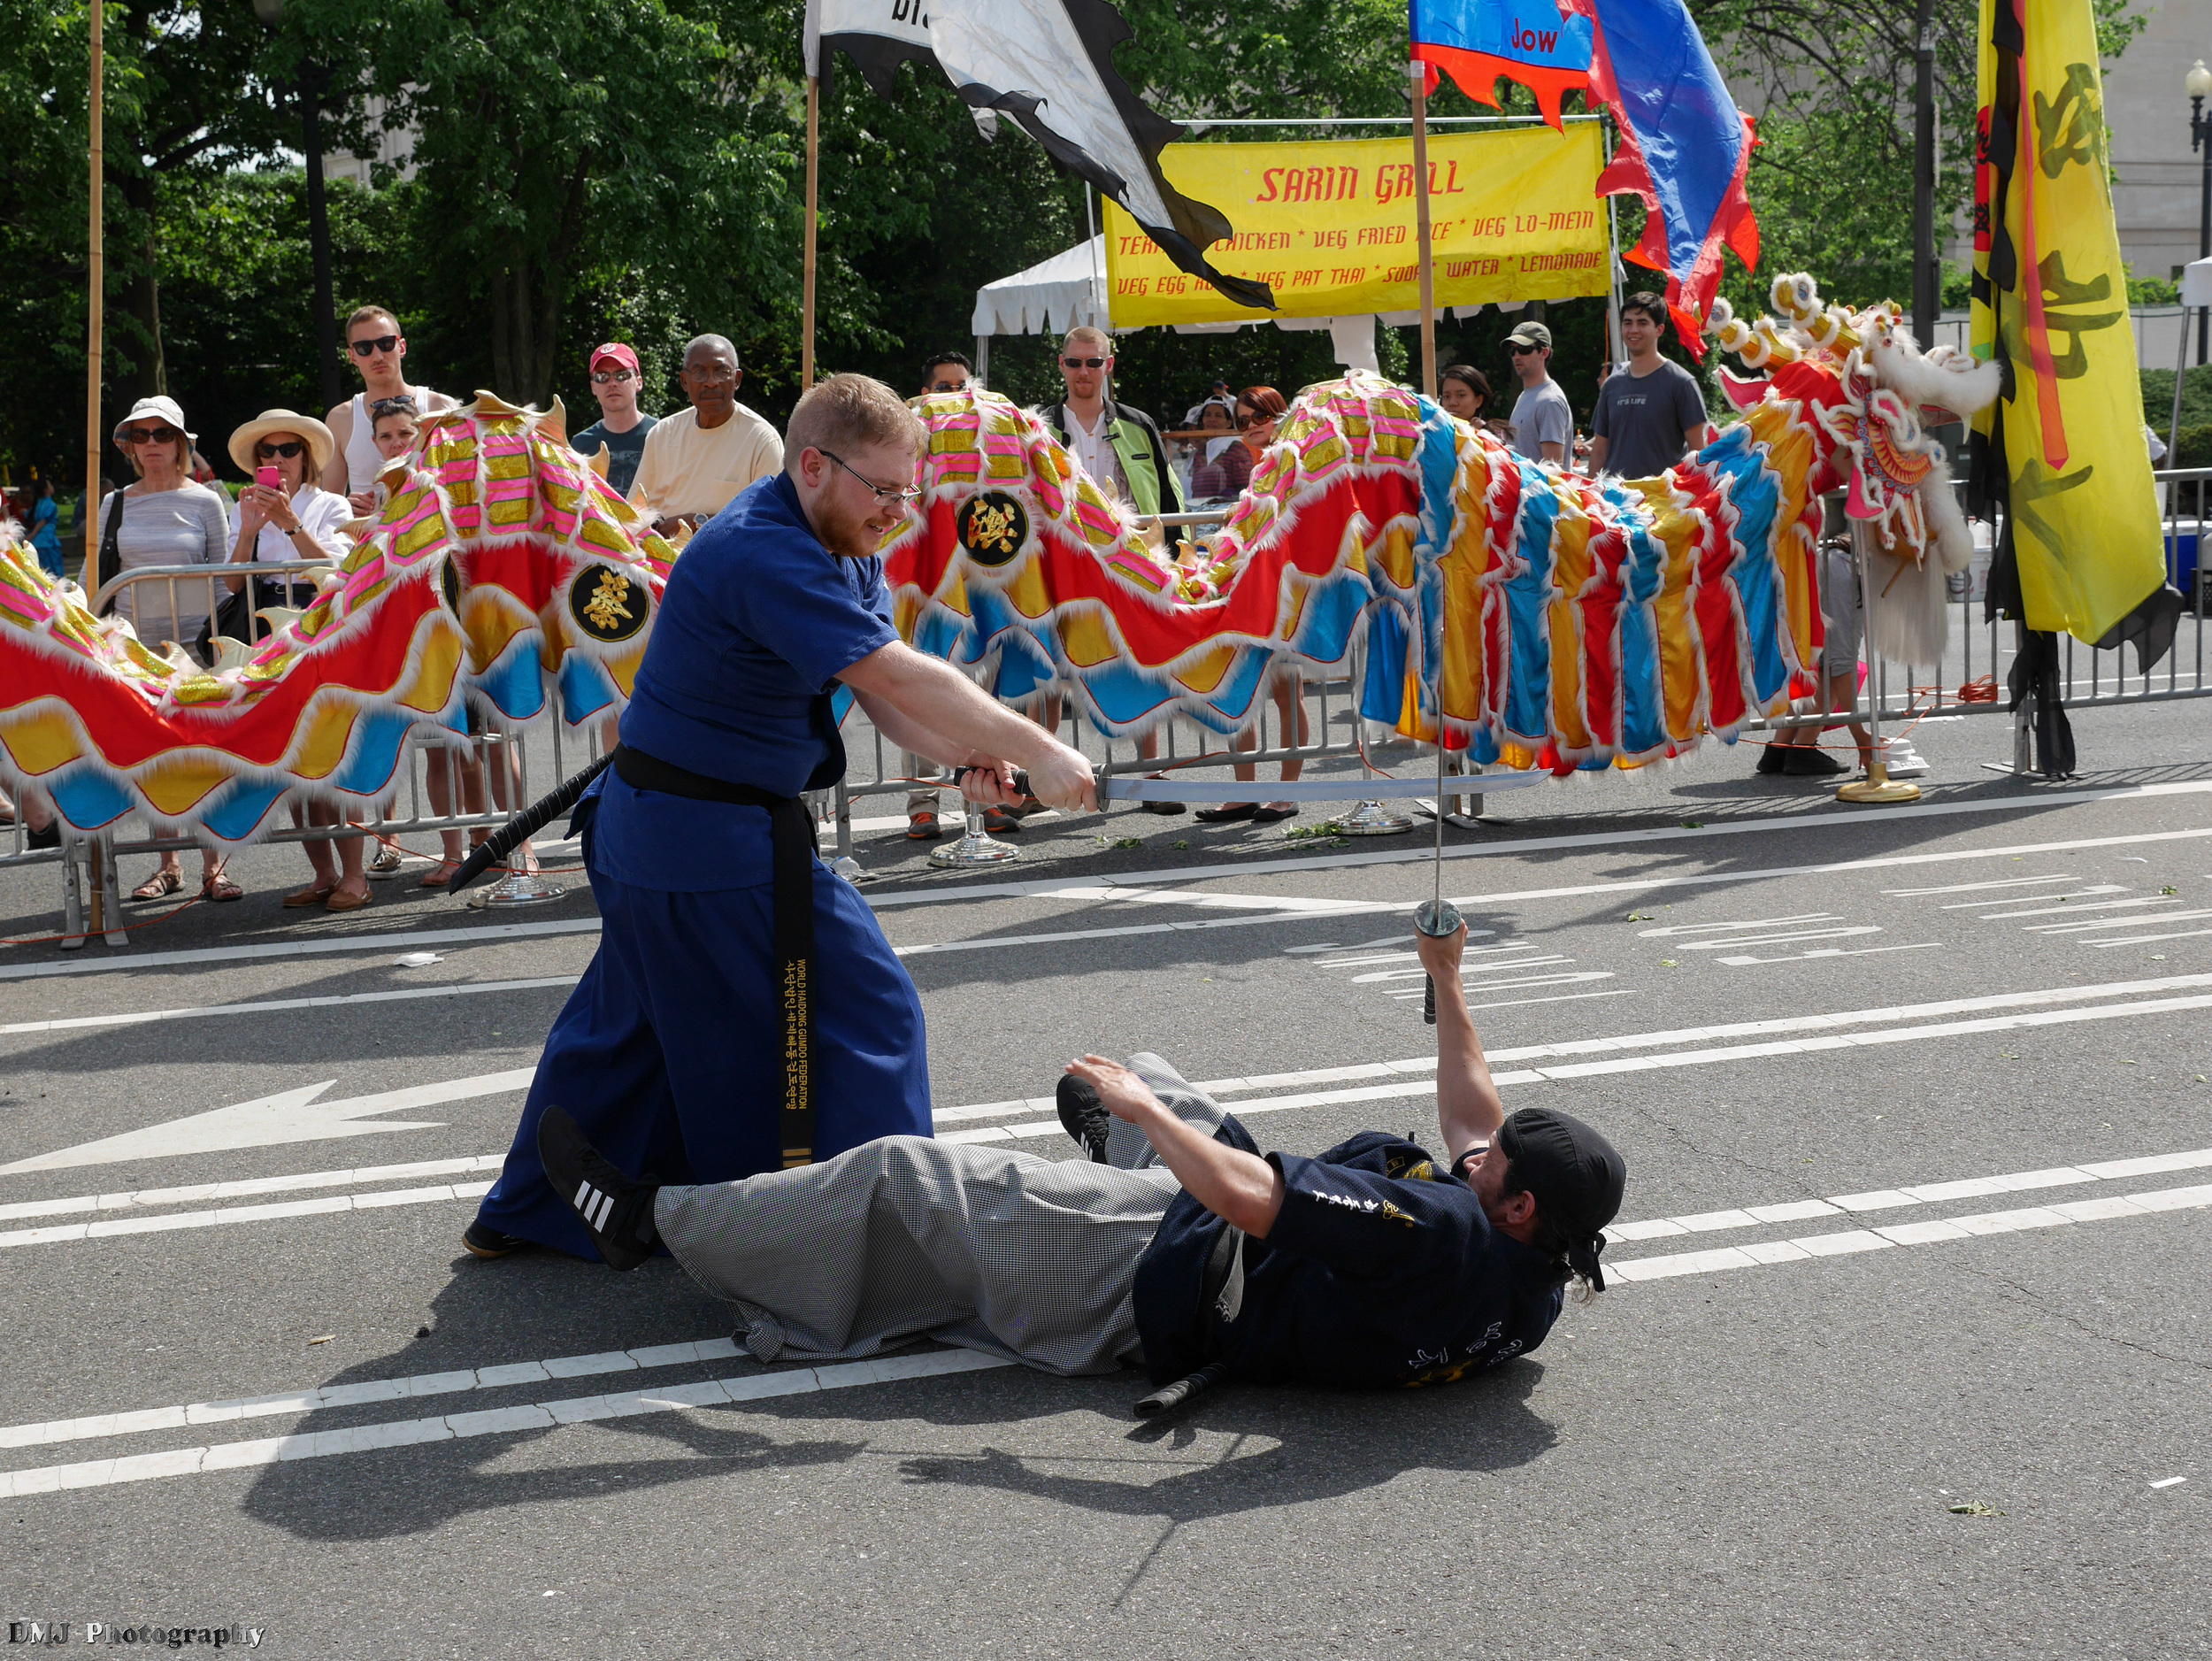 fiesta_asia_street_festival_2015_martial_arts_16.jpg